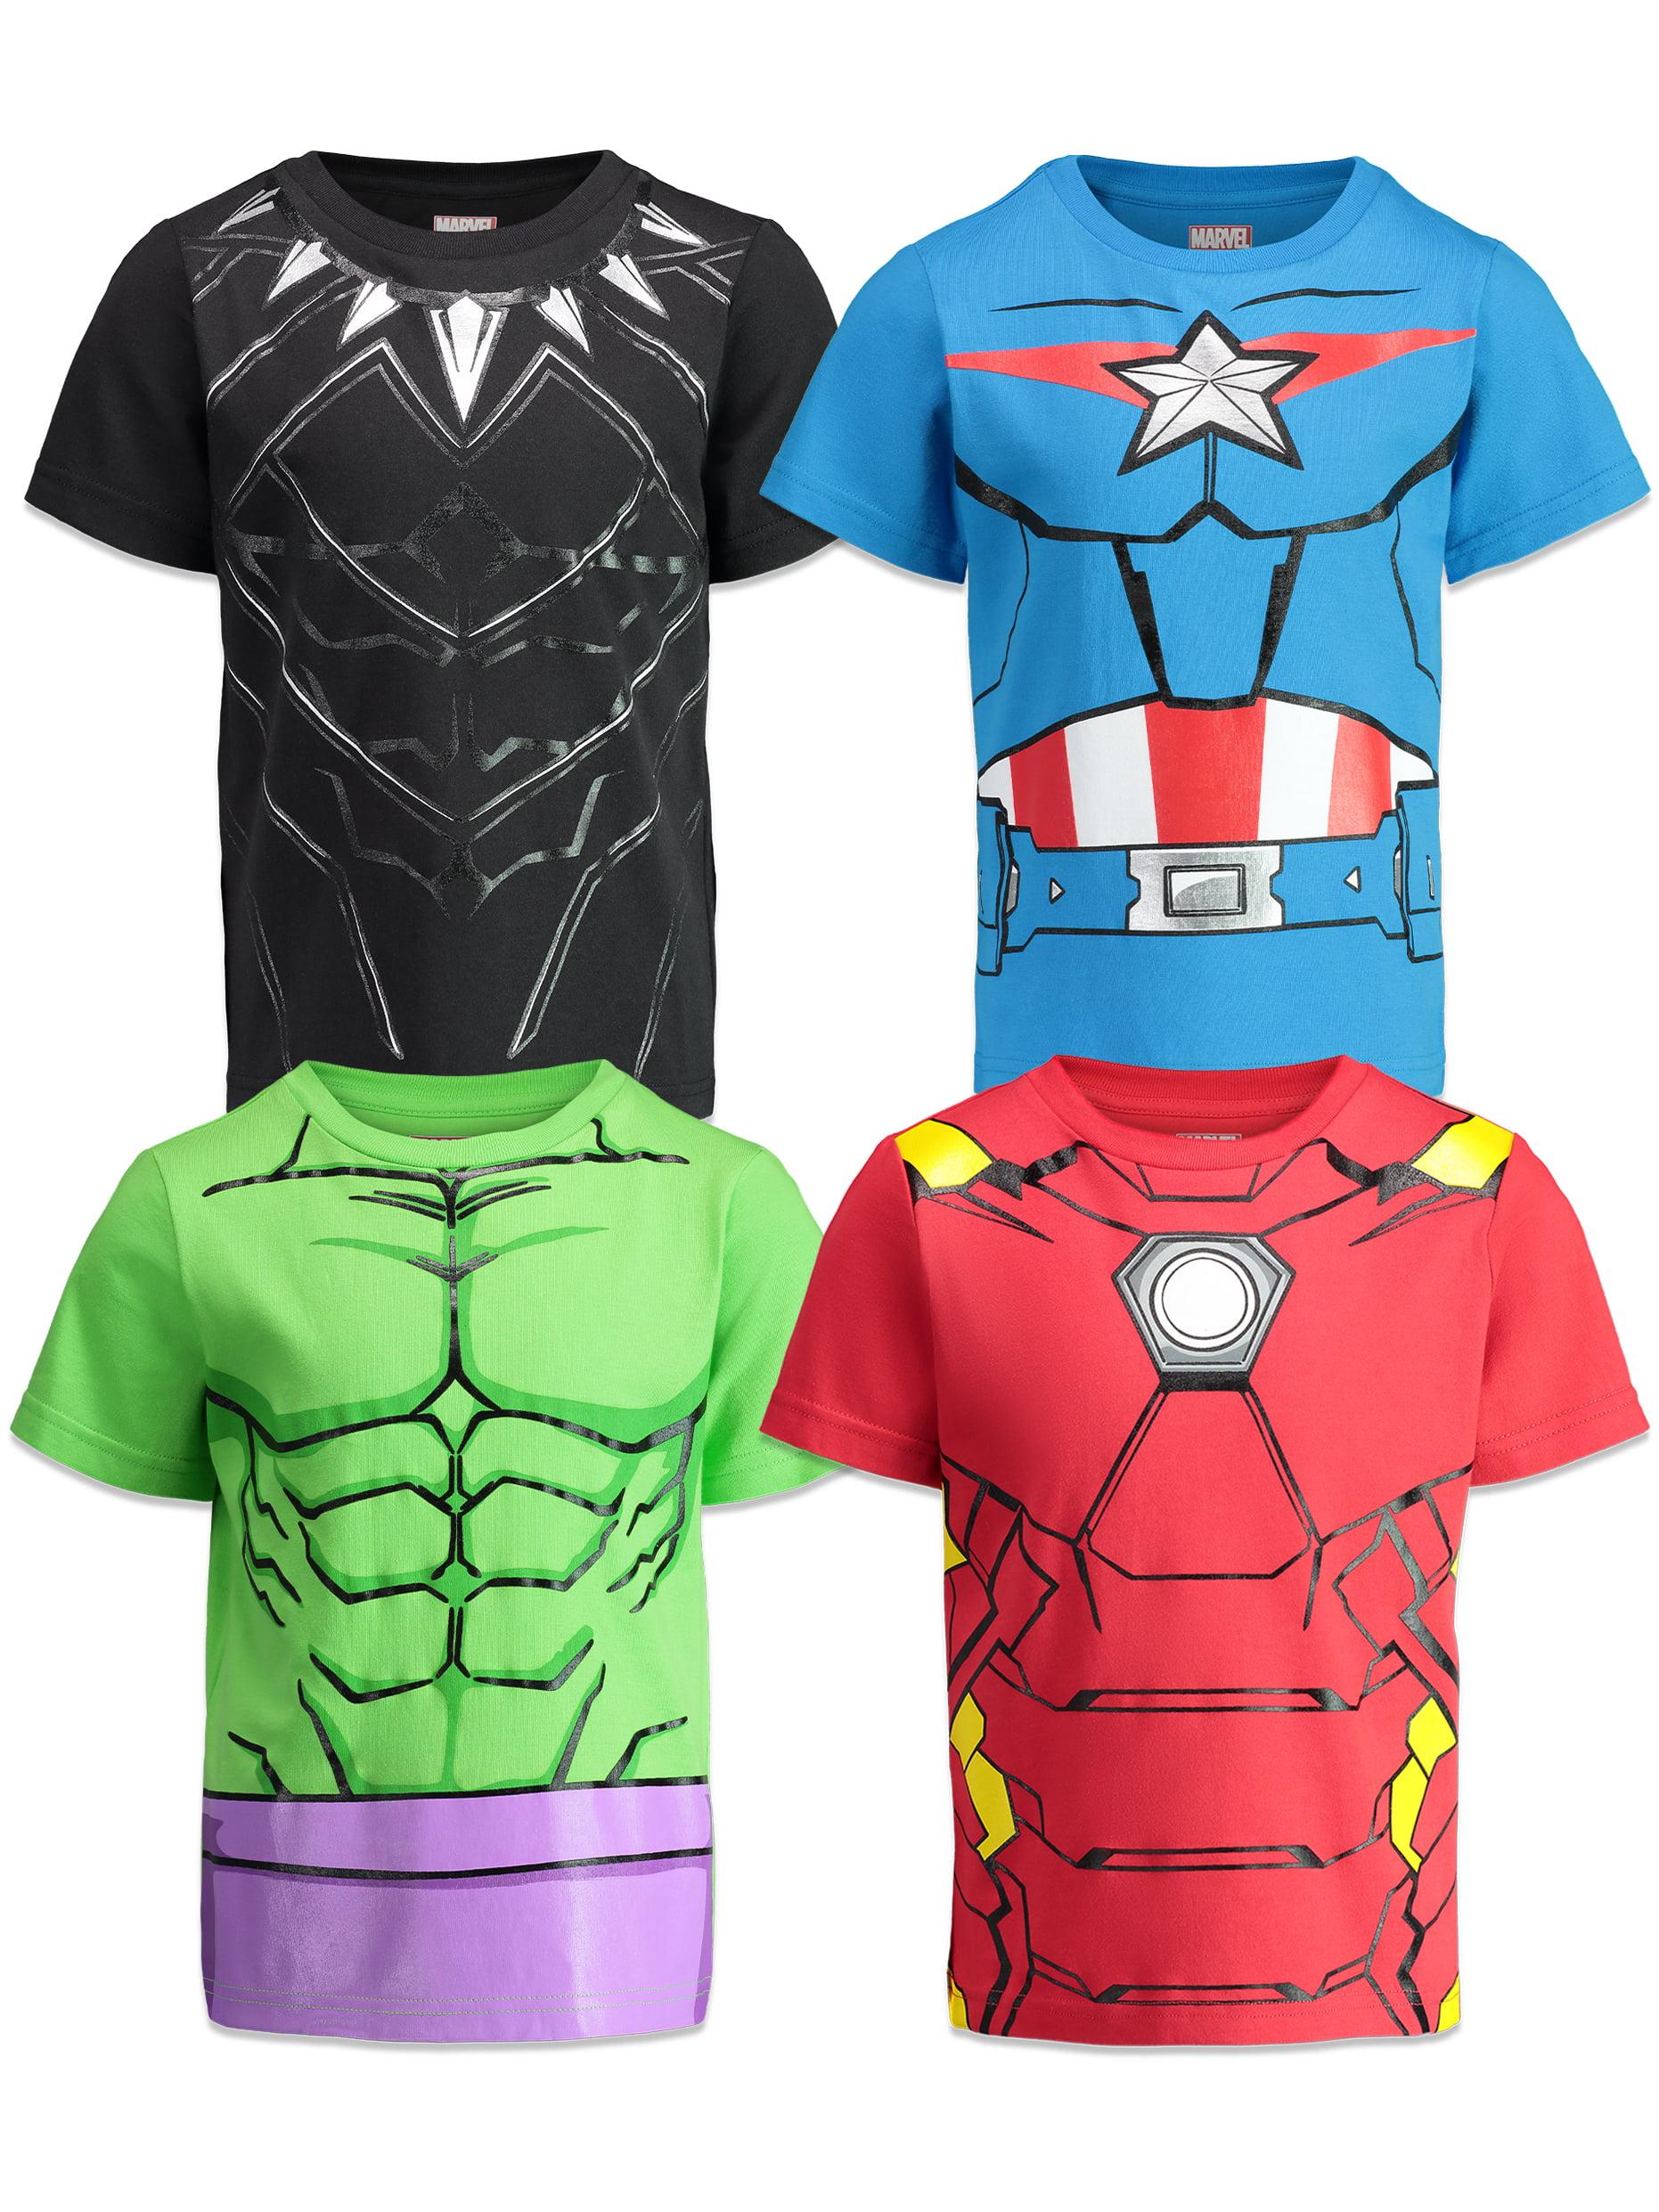 Marvel Boys Iron Man and Hulk Christmas Day Sweatshirt